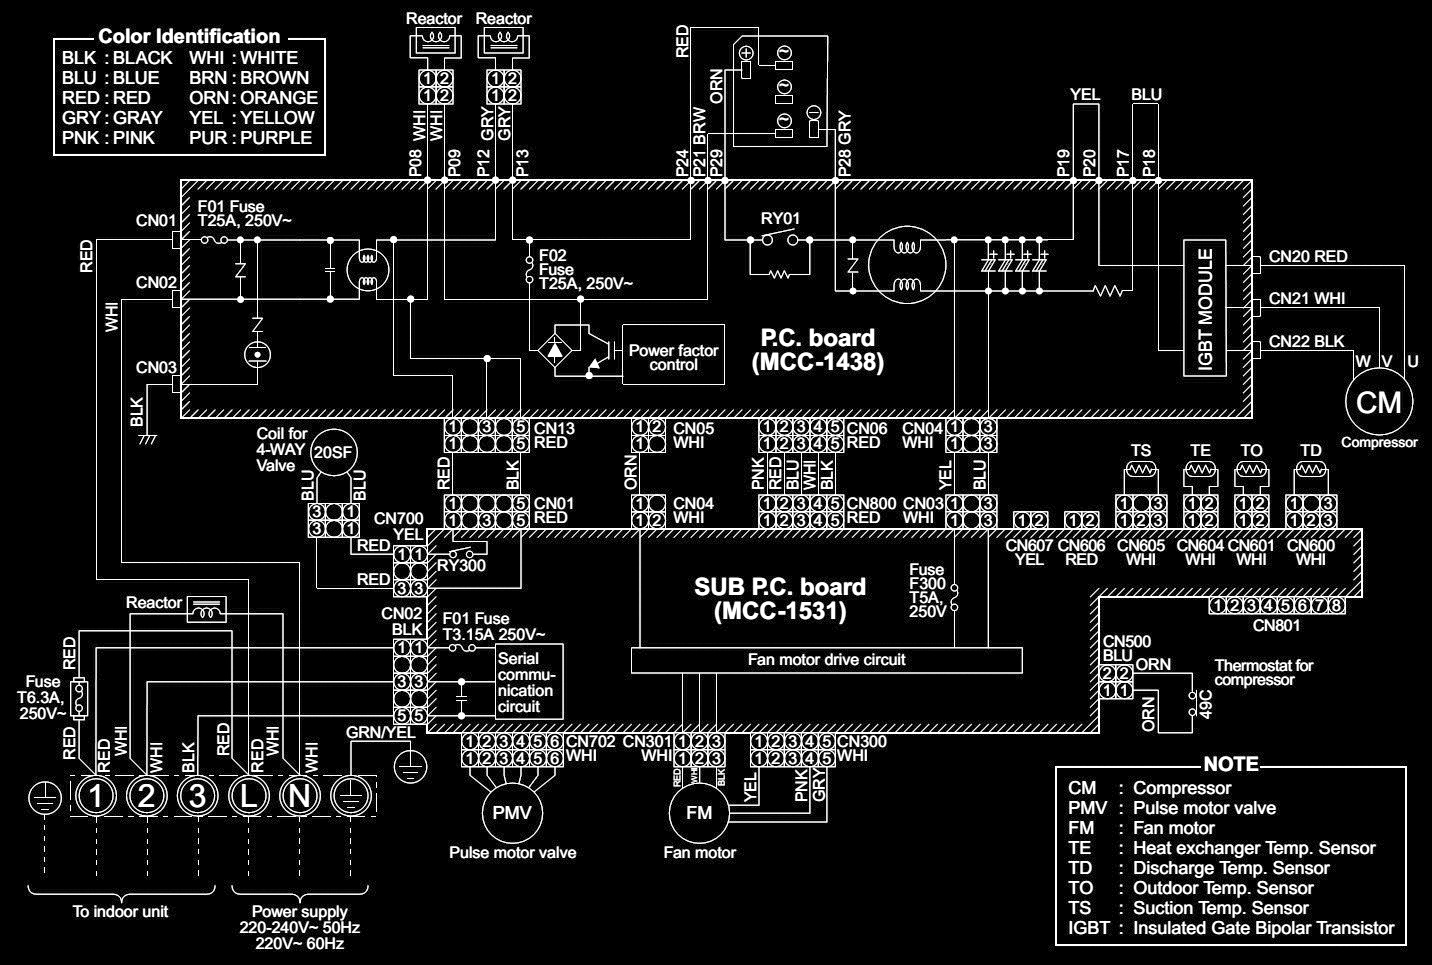 toshiba air conditioner wiring diagram conditioner wiring diagram toshiba split air conditioner ravsm562at ravsm1402at [ 1432 x 965 Pixel ]